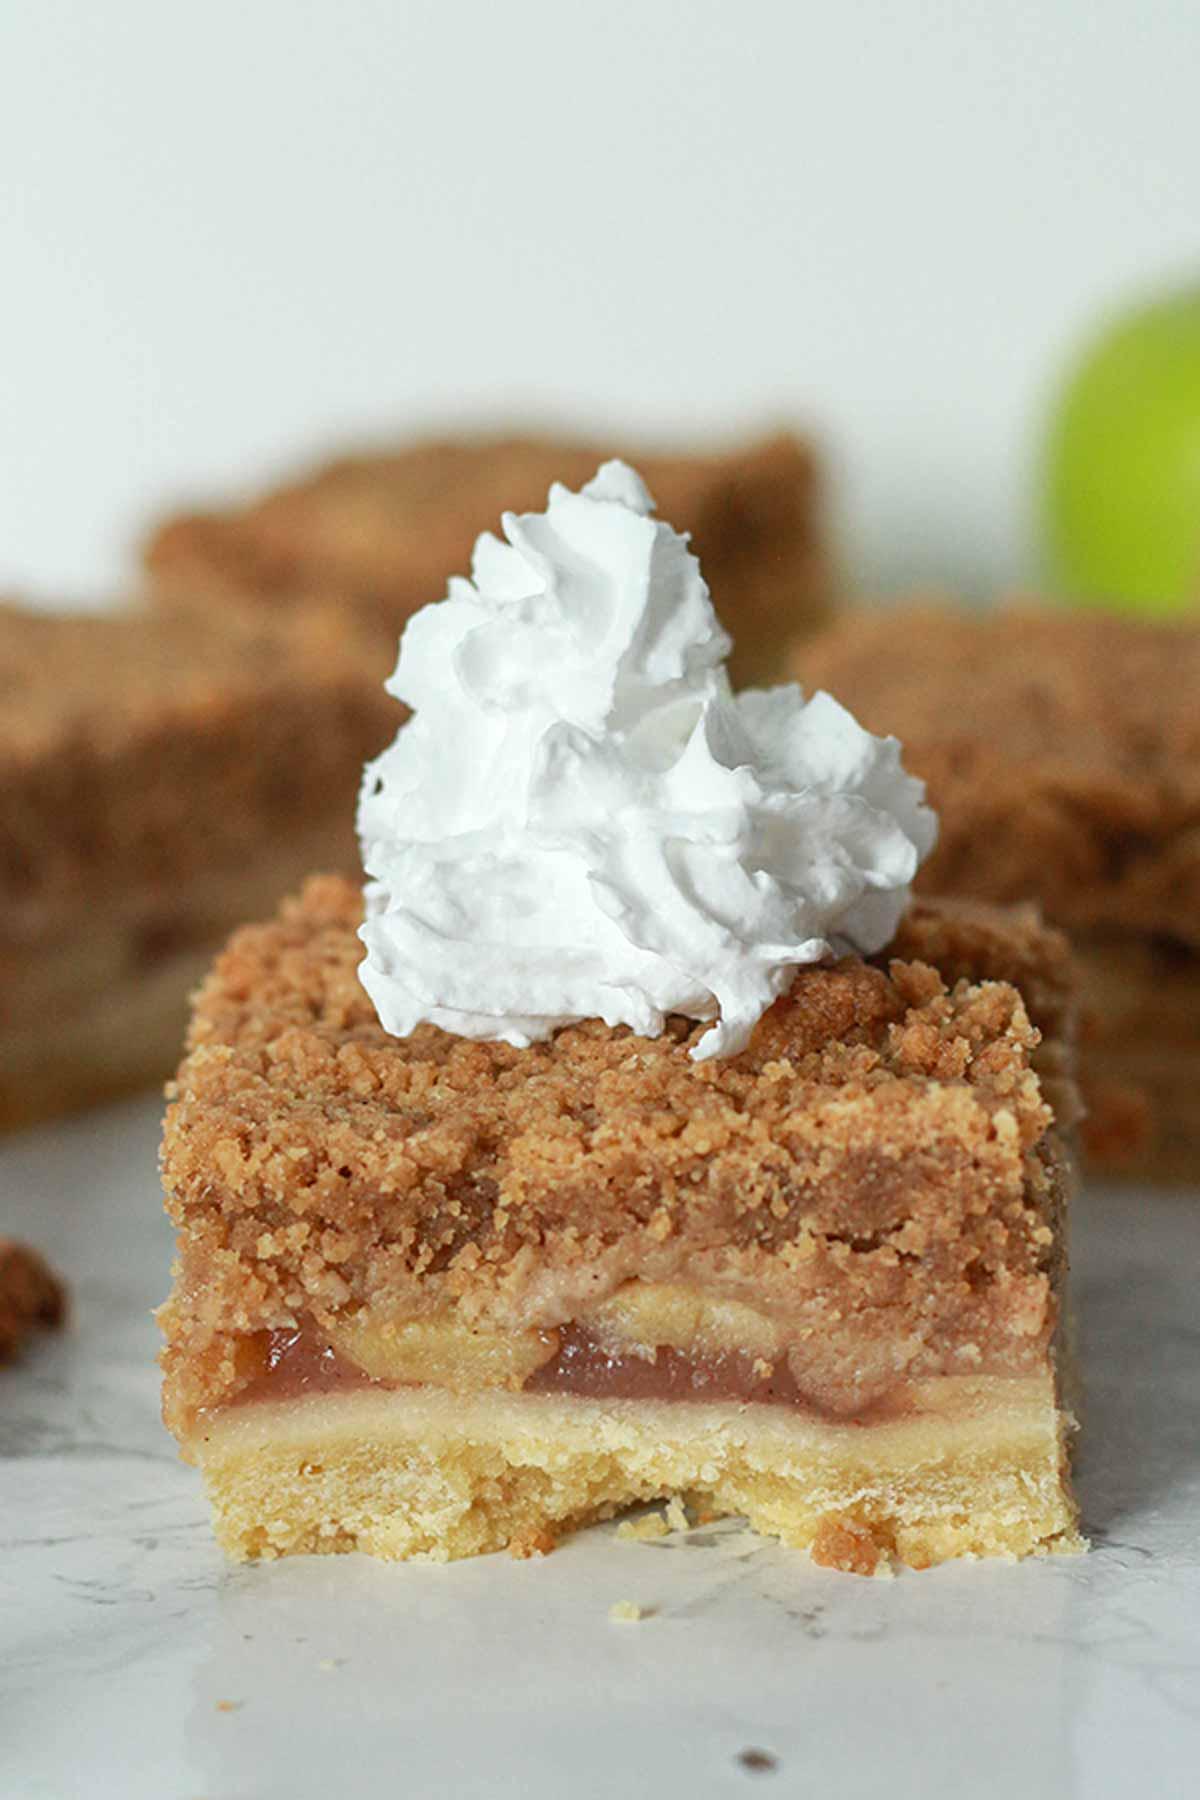 Vegan Apple Crumble Bar With Cream On Top